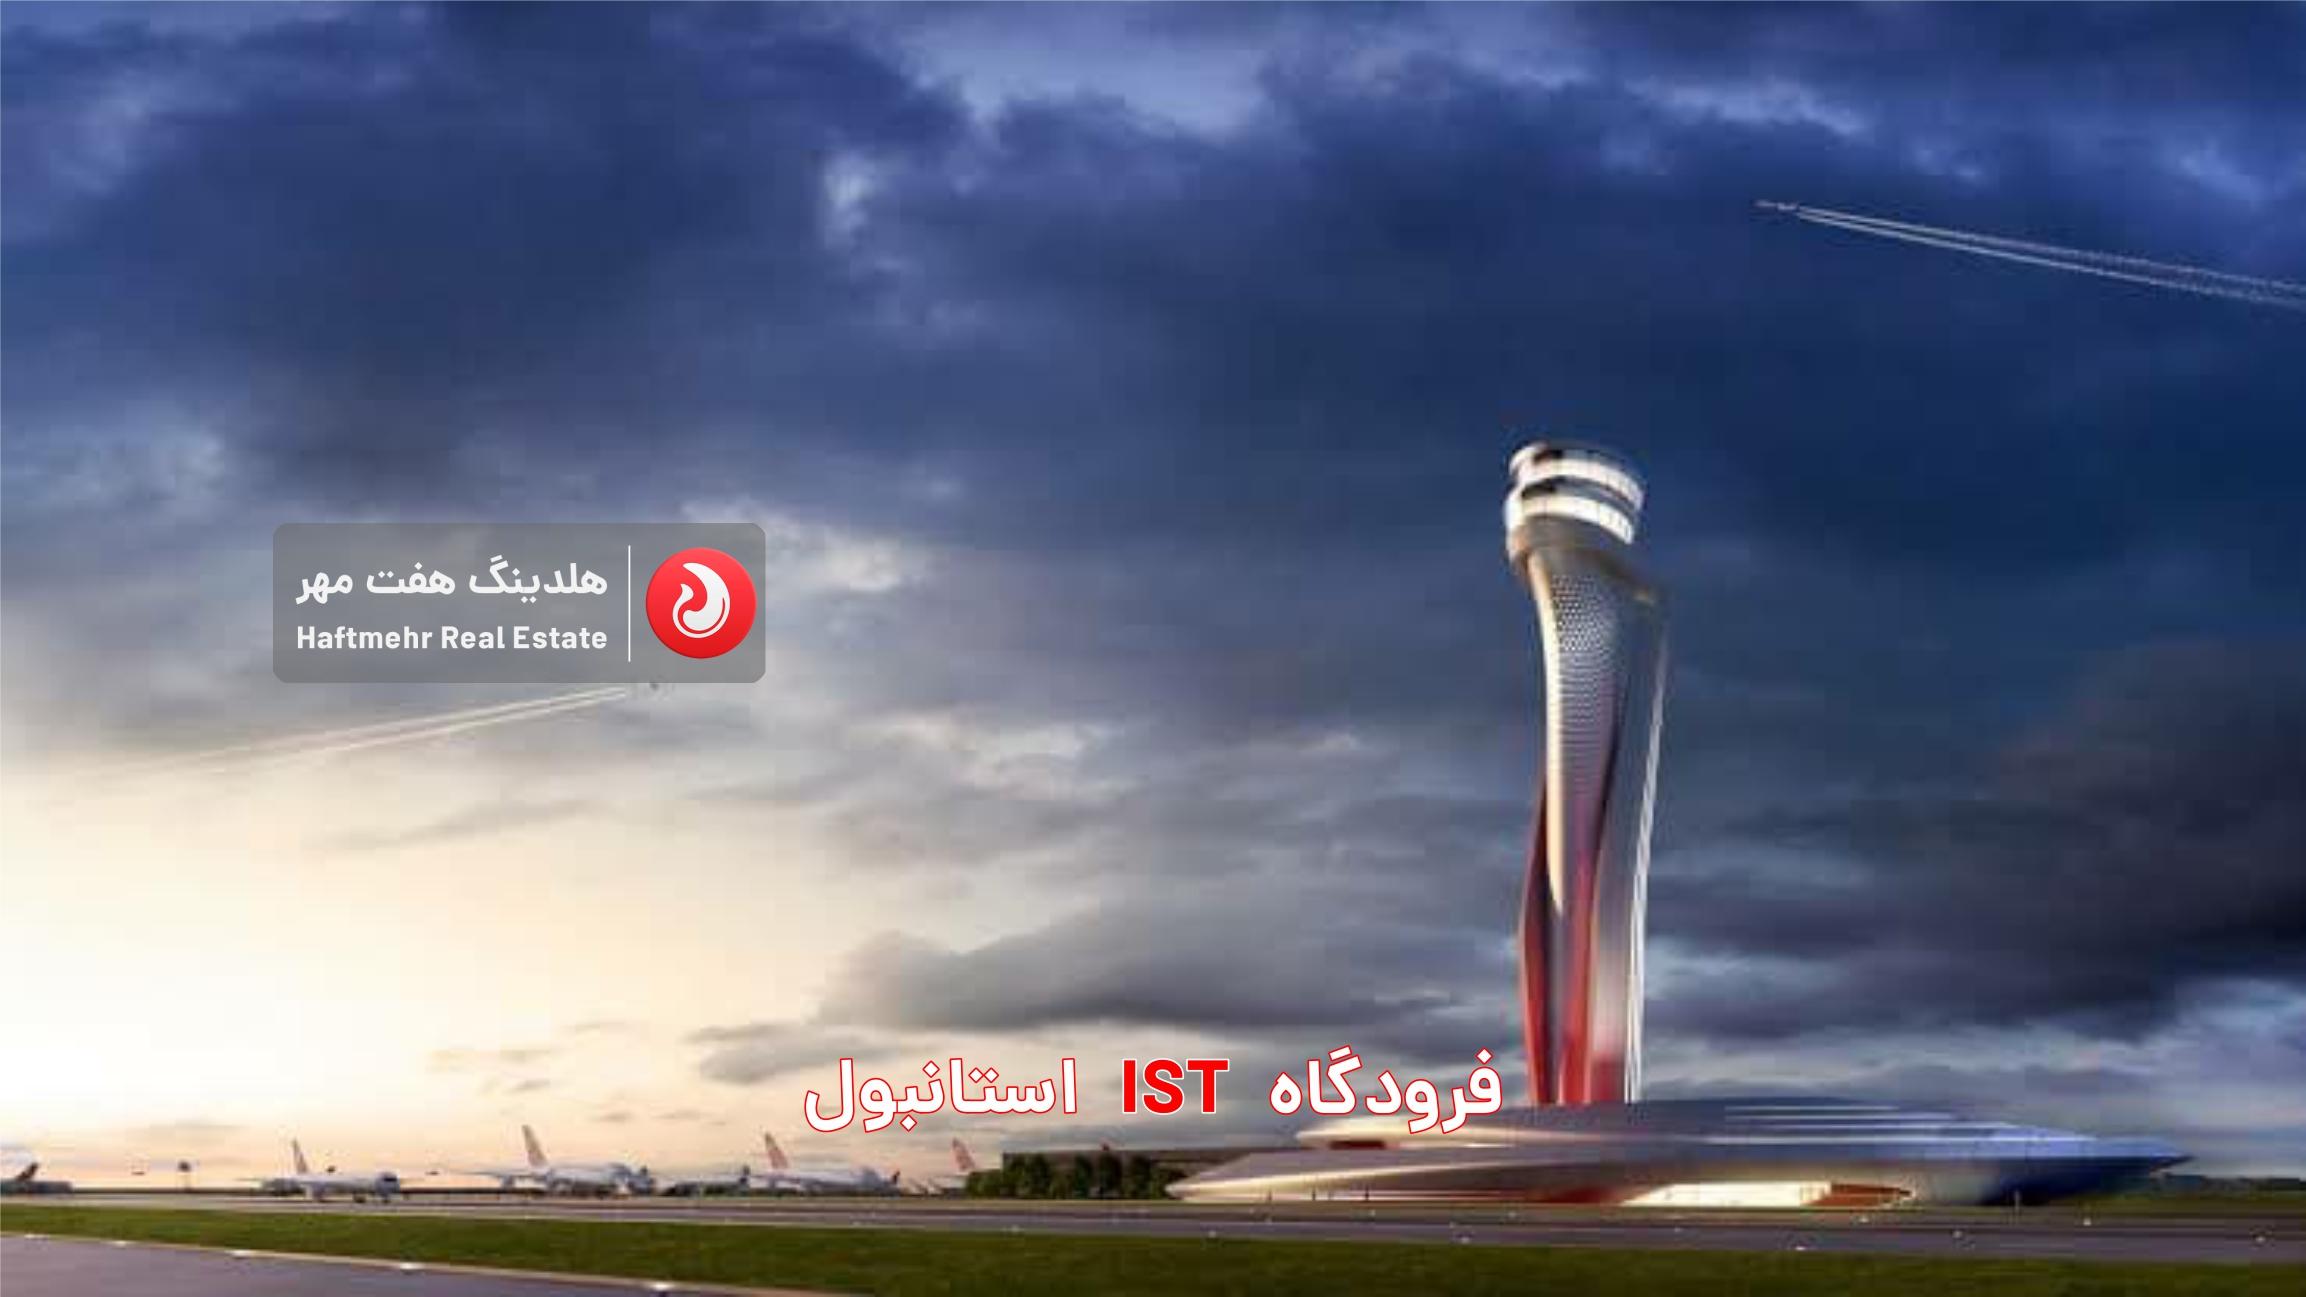 فرودگاه IST استانبول